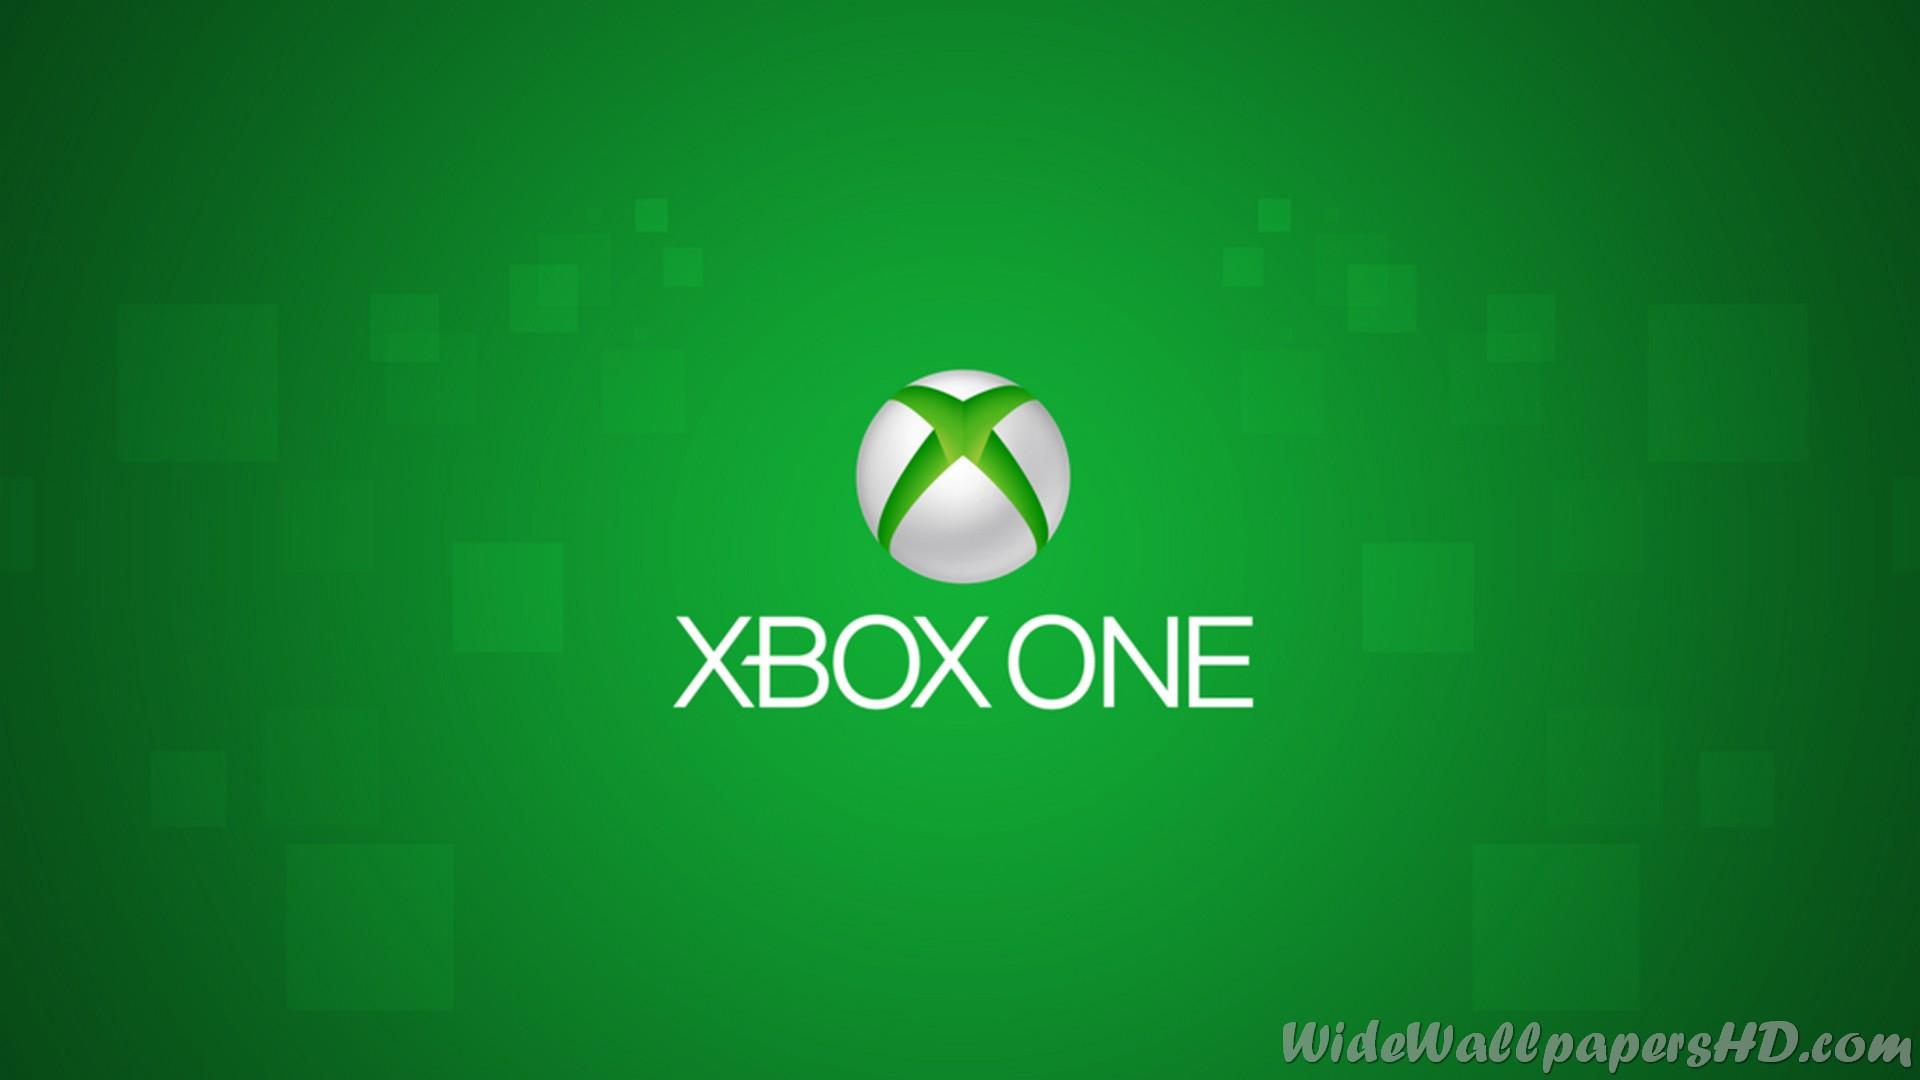 48 Xbox One Wallpaper 1920x1080 On Wallpapersafari